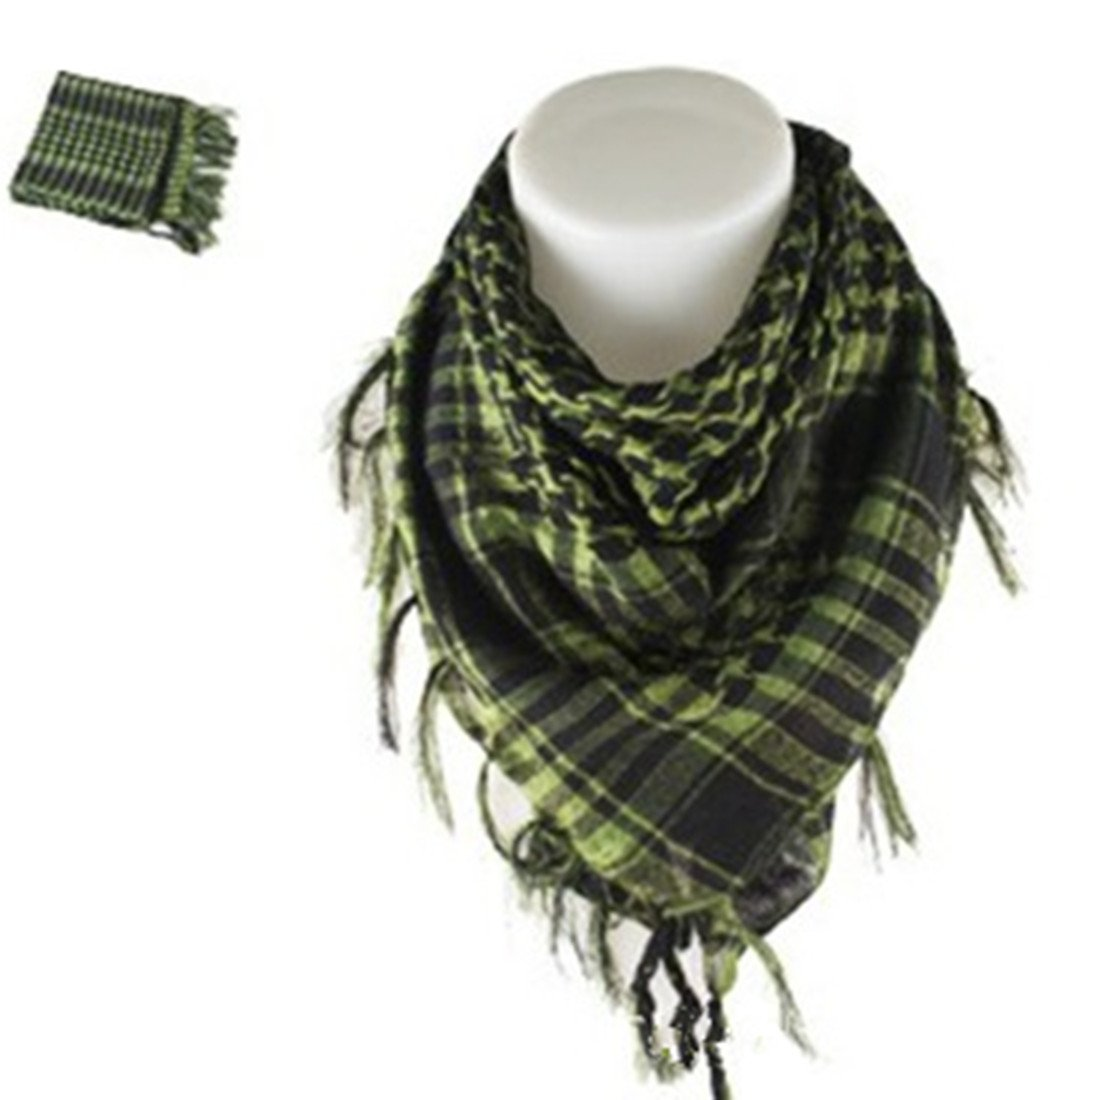 Lovelyee 100% Cotton Military Shemagh Tactical Desert Keffiyeh Head Neck Scarf Arab Wrap (Amry Green)